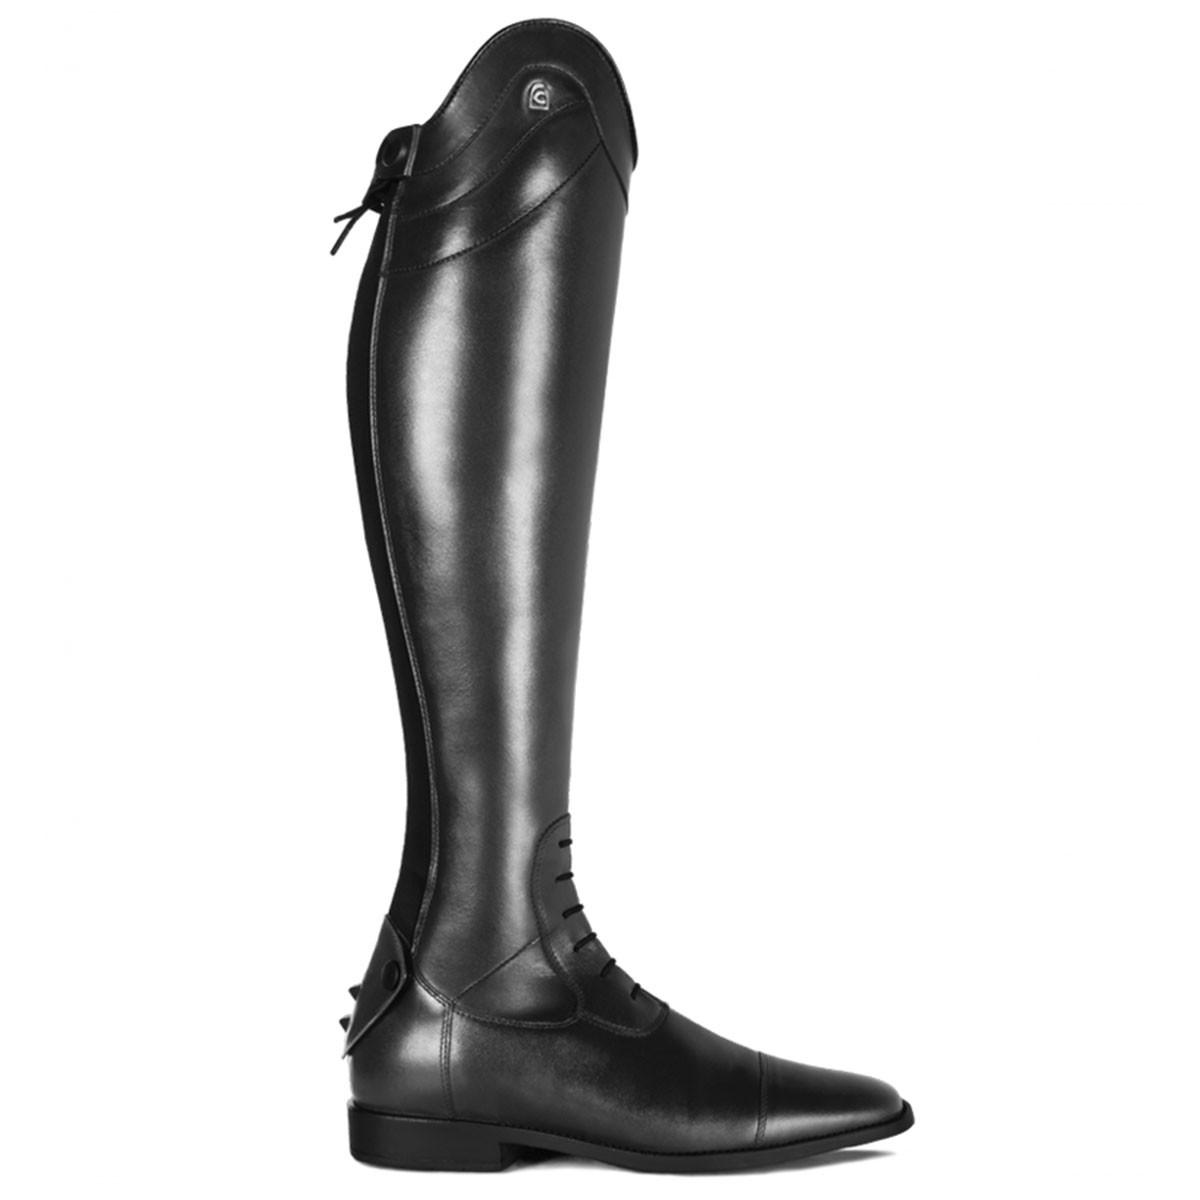 Cavallo Linus Slim rijlaars zwart maat:7-7.5 / h47-w33